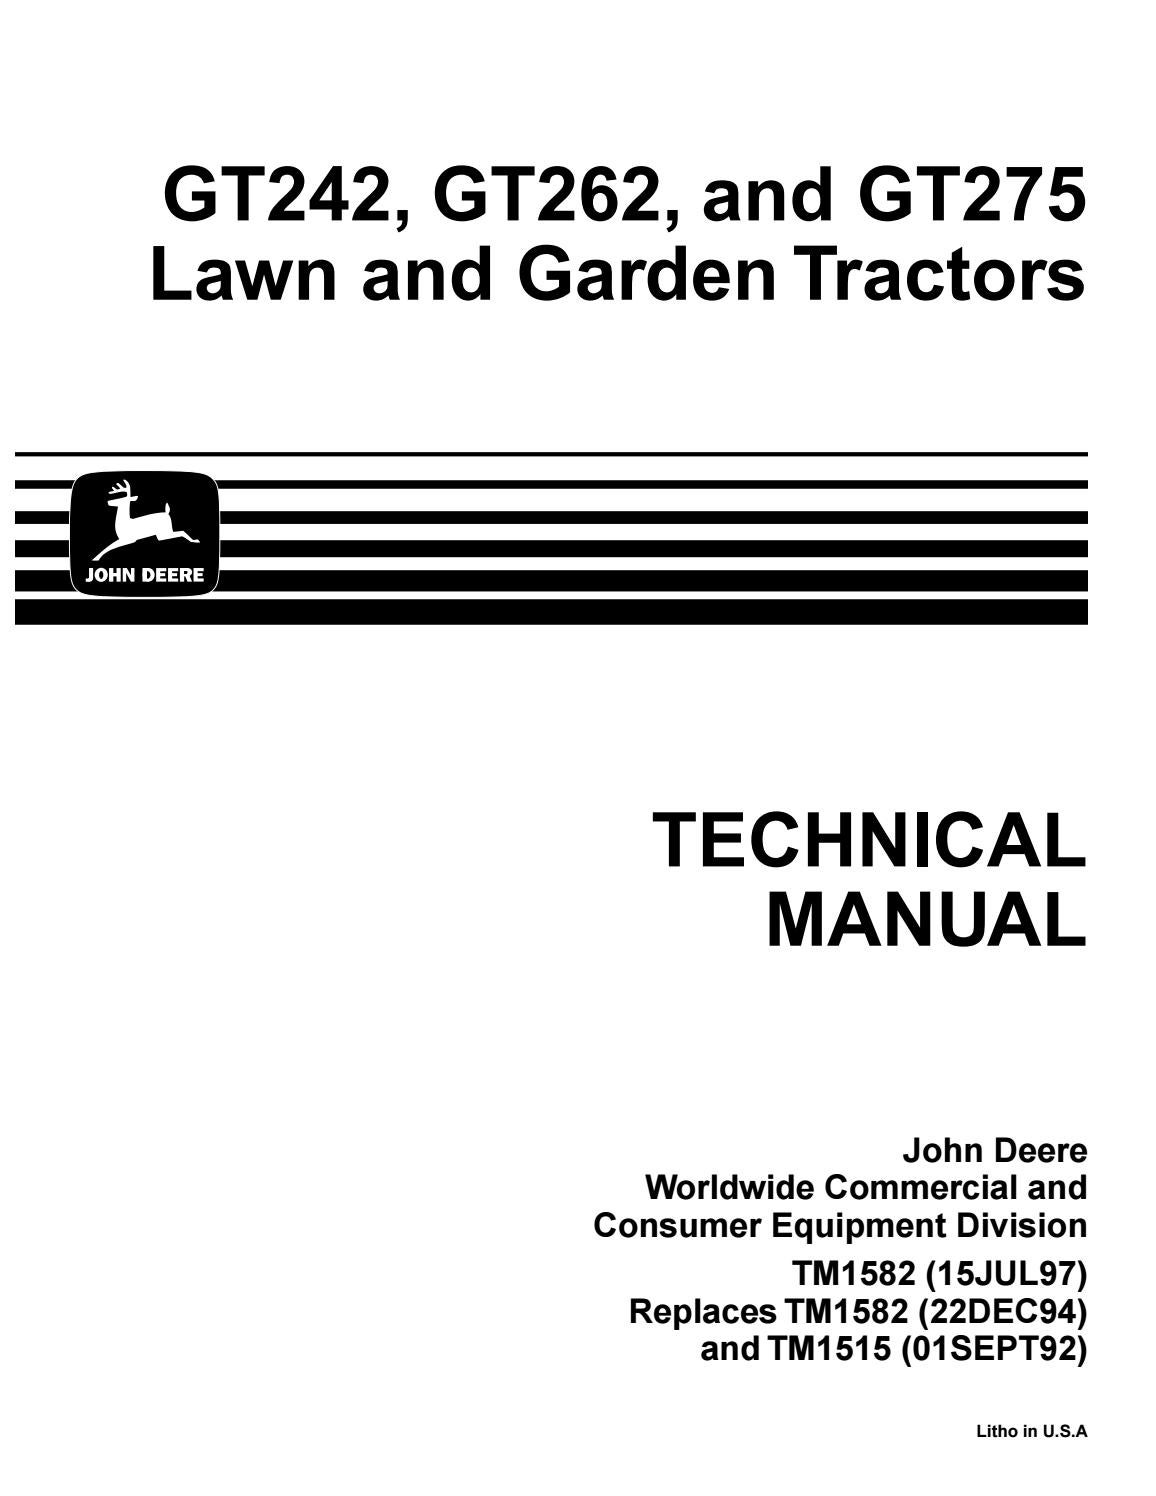 JOHN DEERE GT242 LAWN GARDEN TRACTOR Service Repair Manual by 163114103 -  issuu | Gt242 Wiring Diagram |  | Issuu